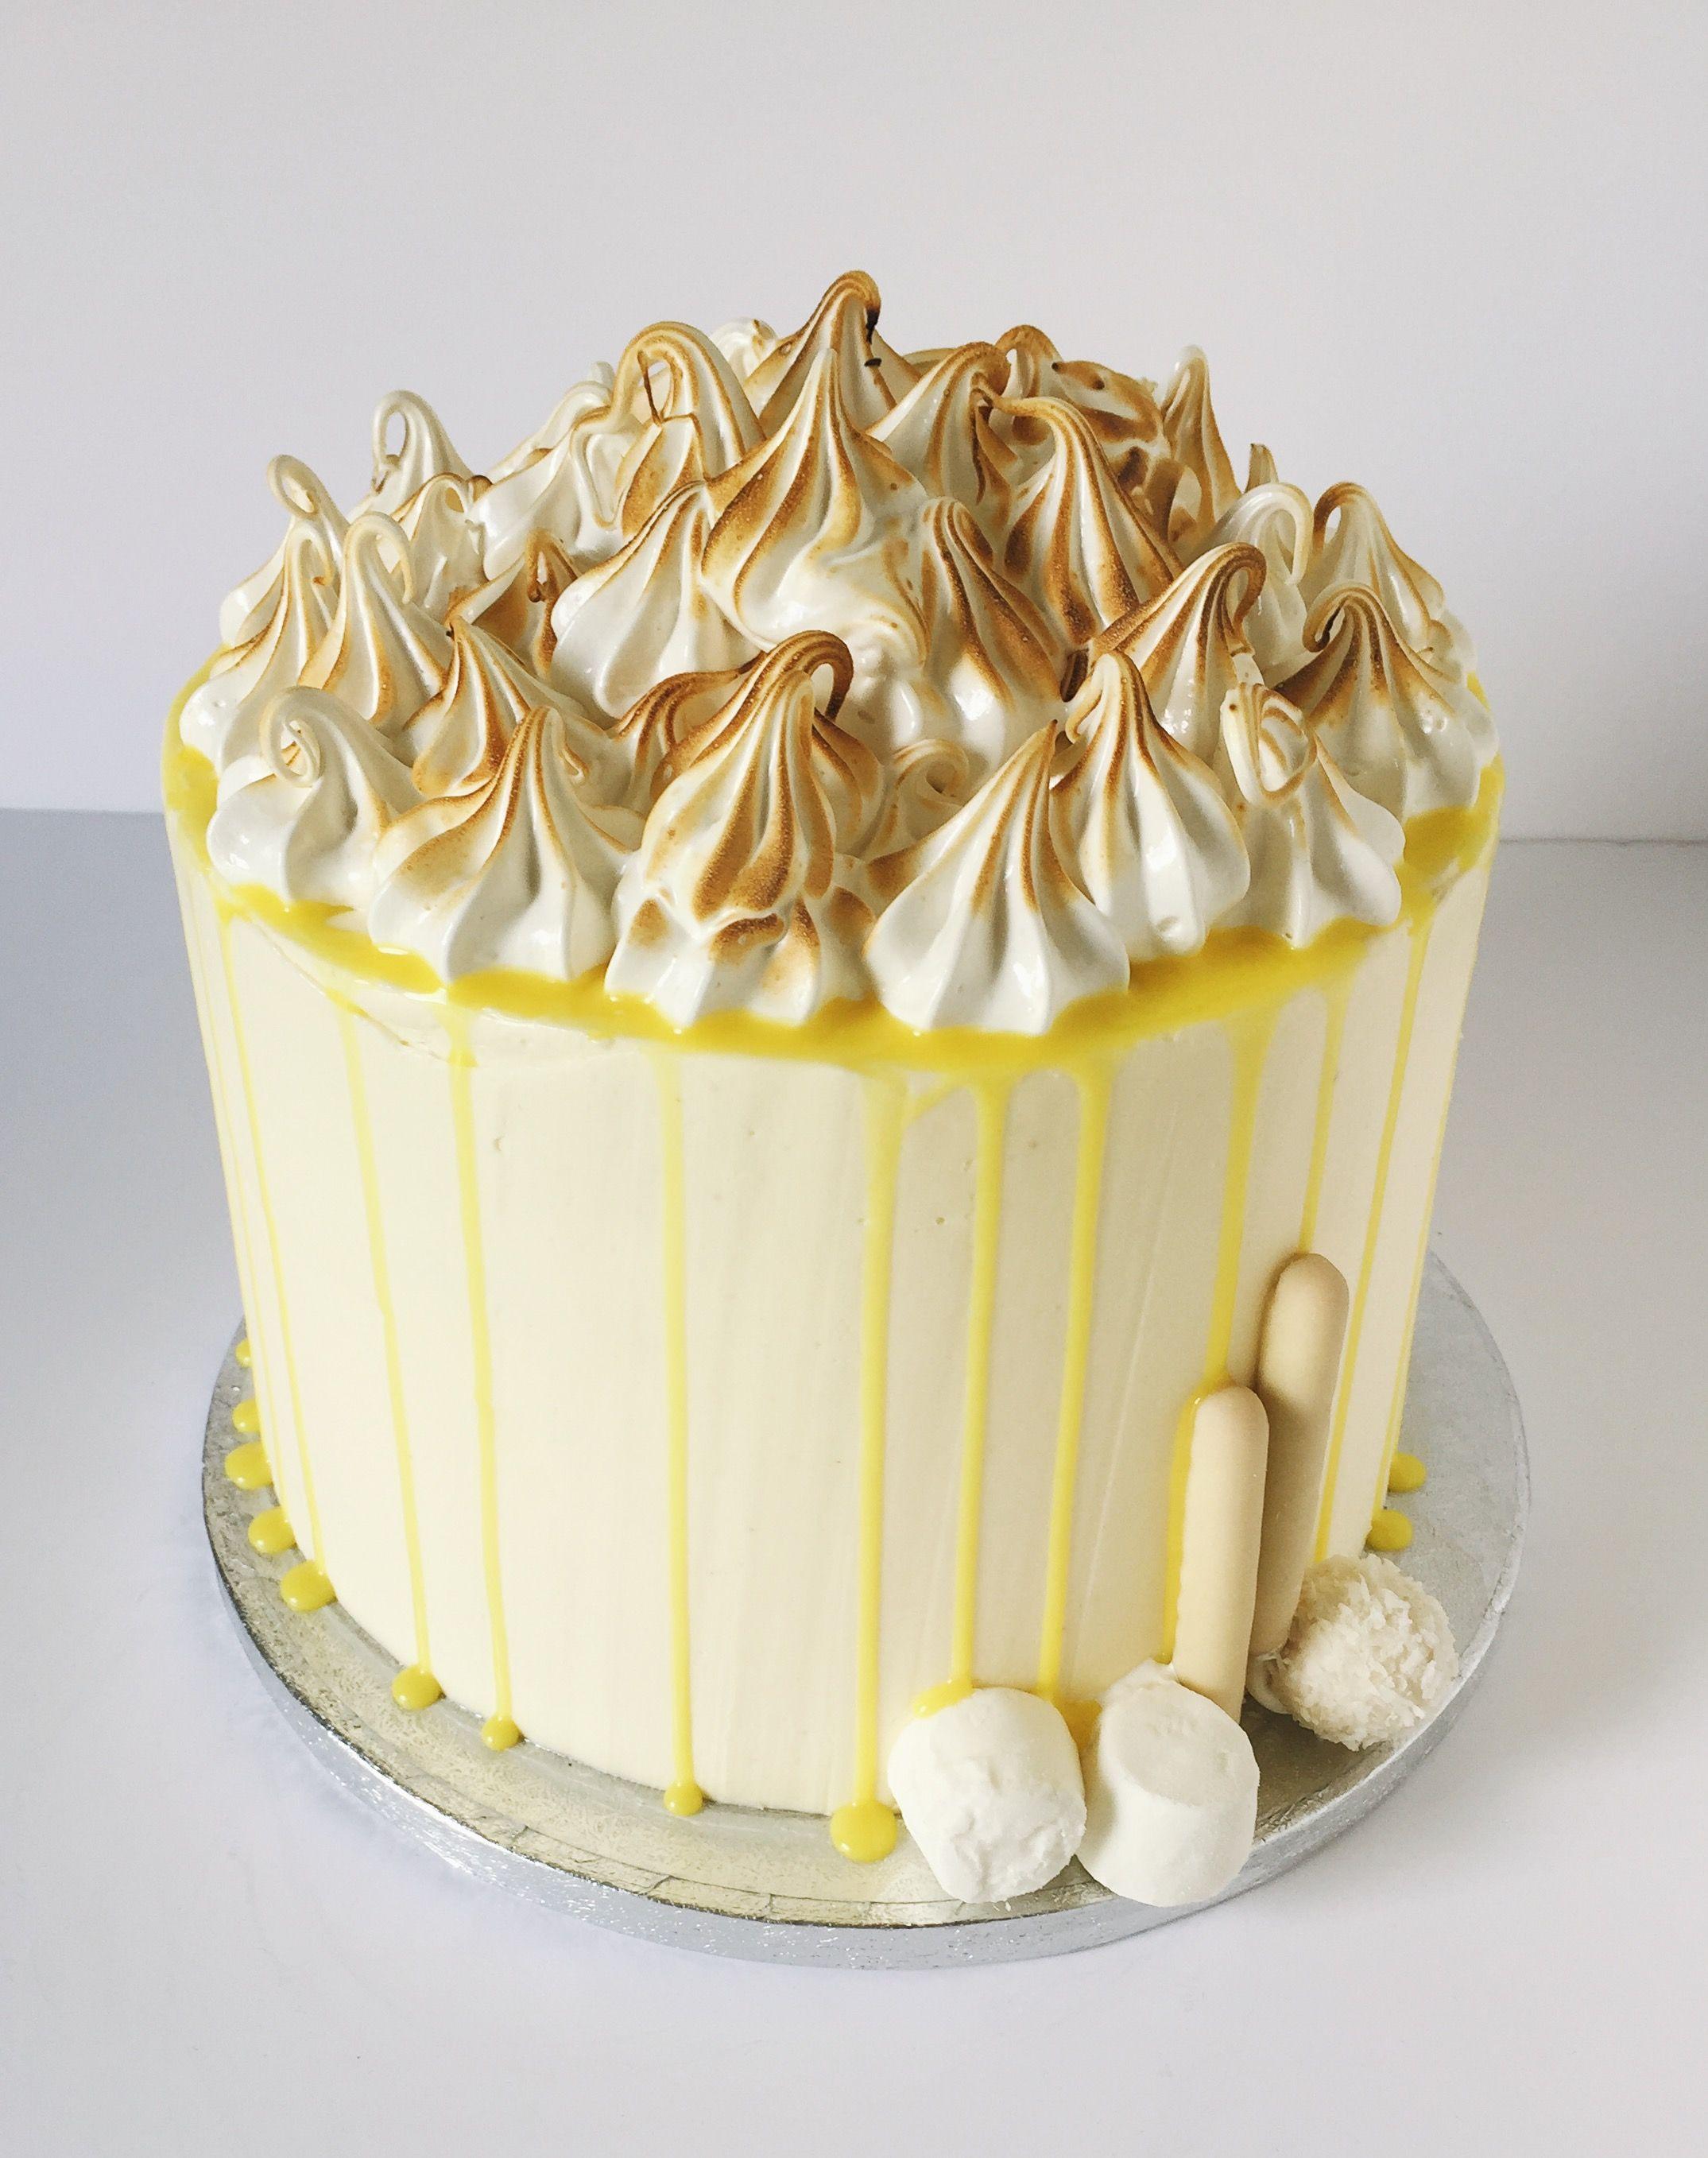 Lemon Meringue Pie Cake With Meringue Marshmallow Frosting